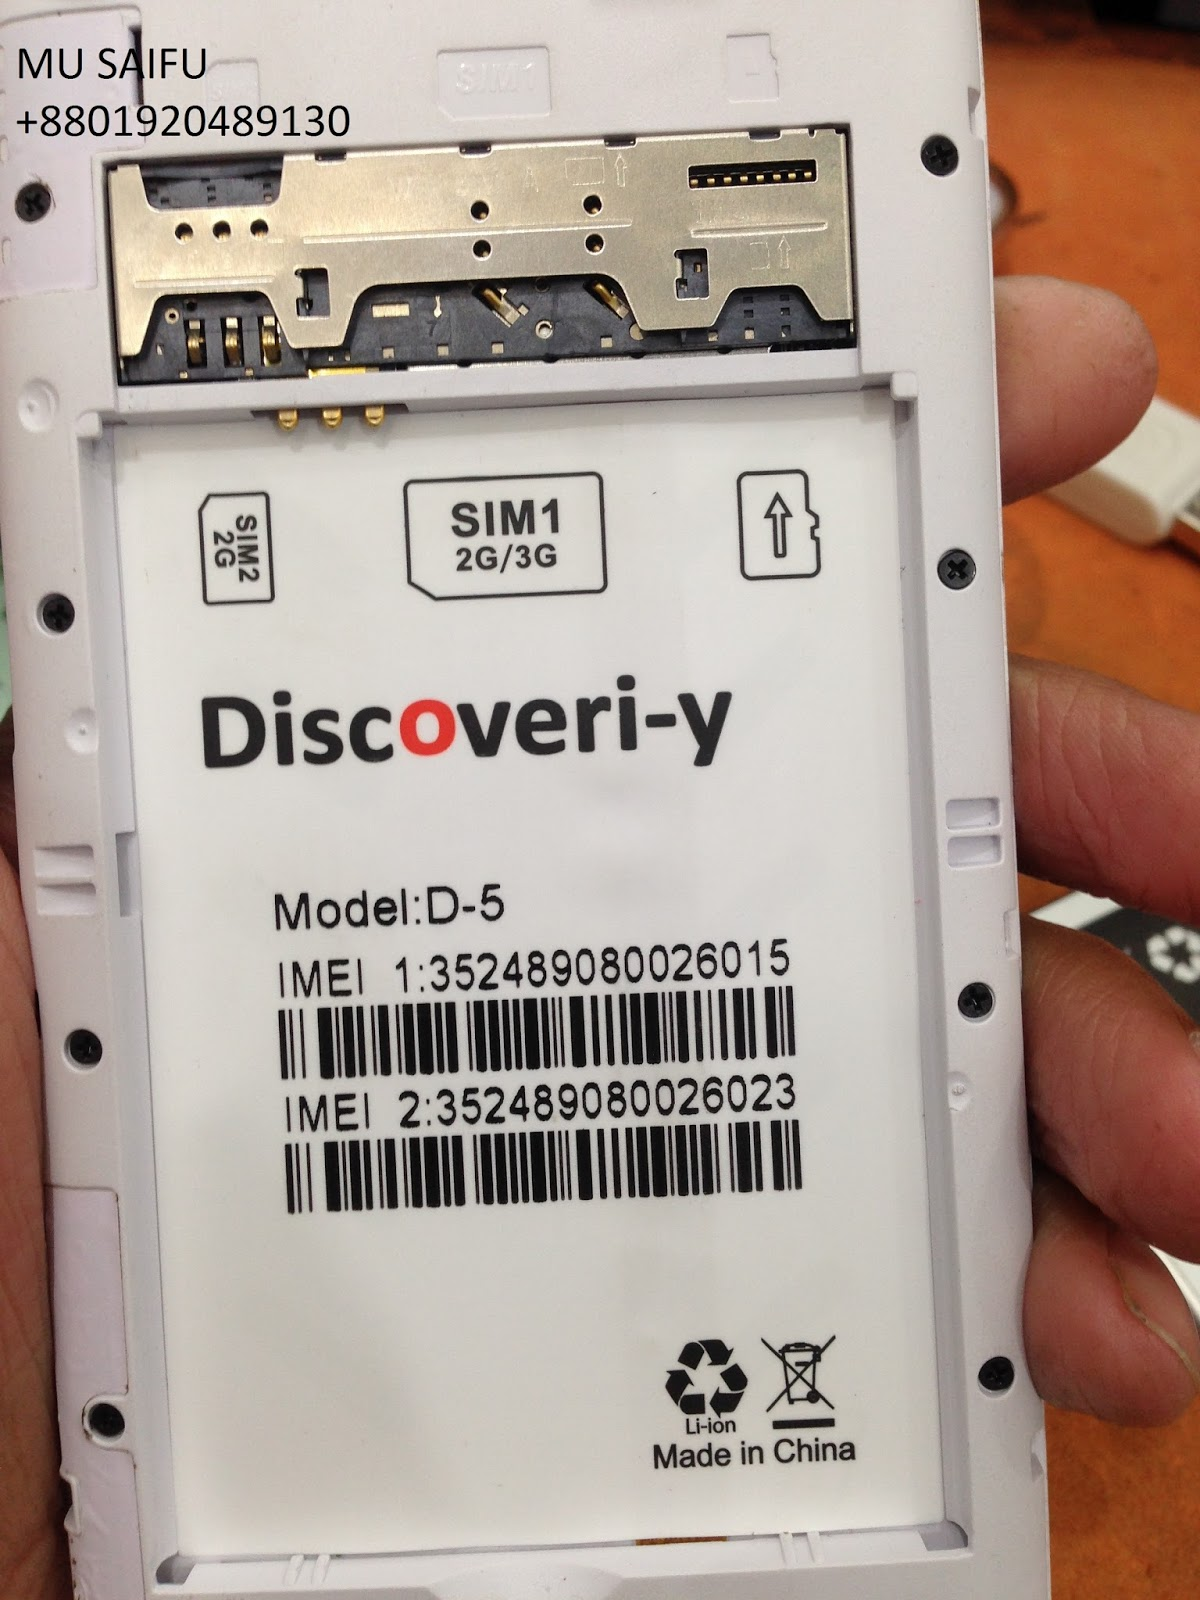 Discoveri-y D-5 Flash File Firmware | SAMSUNG FRP LOCK & SAMSUNG